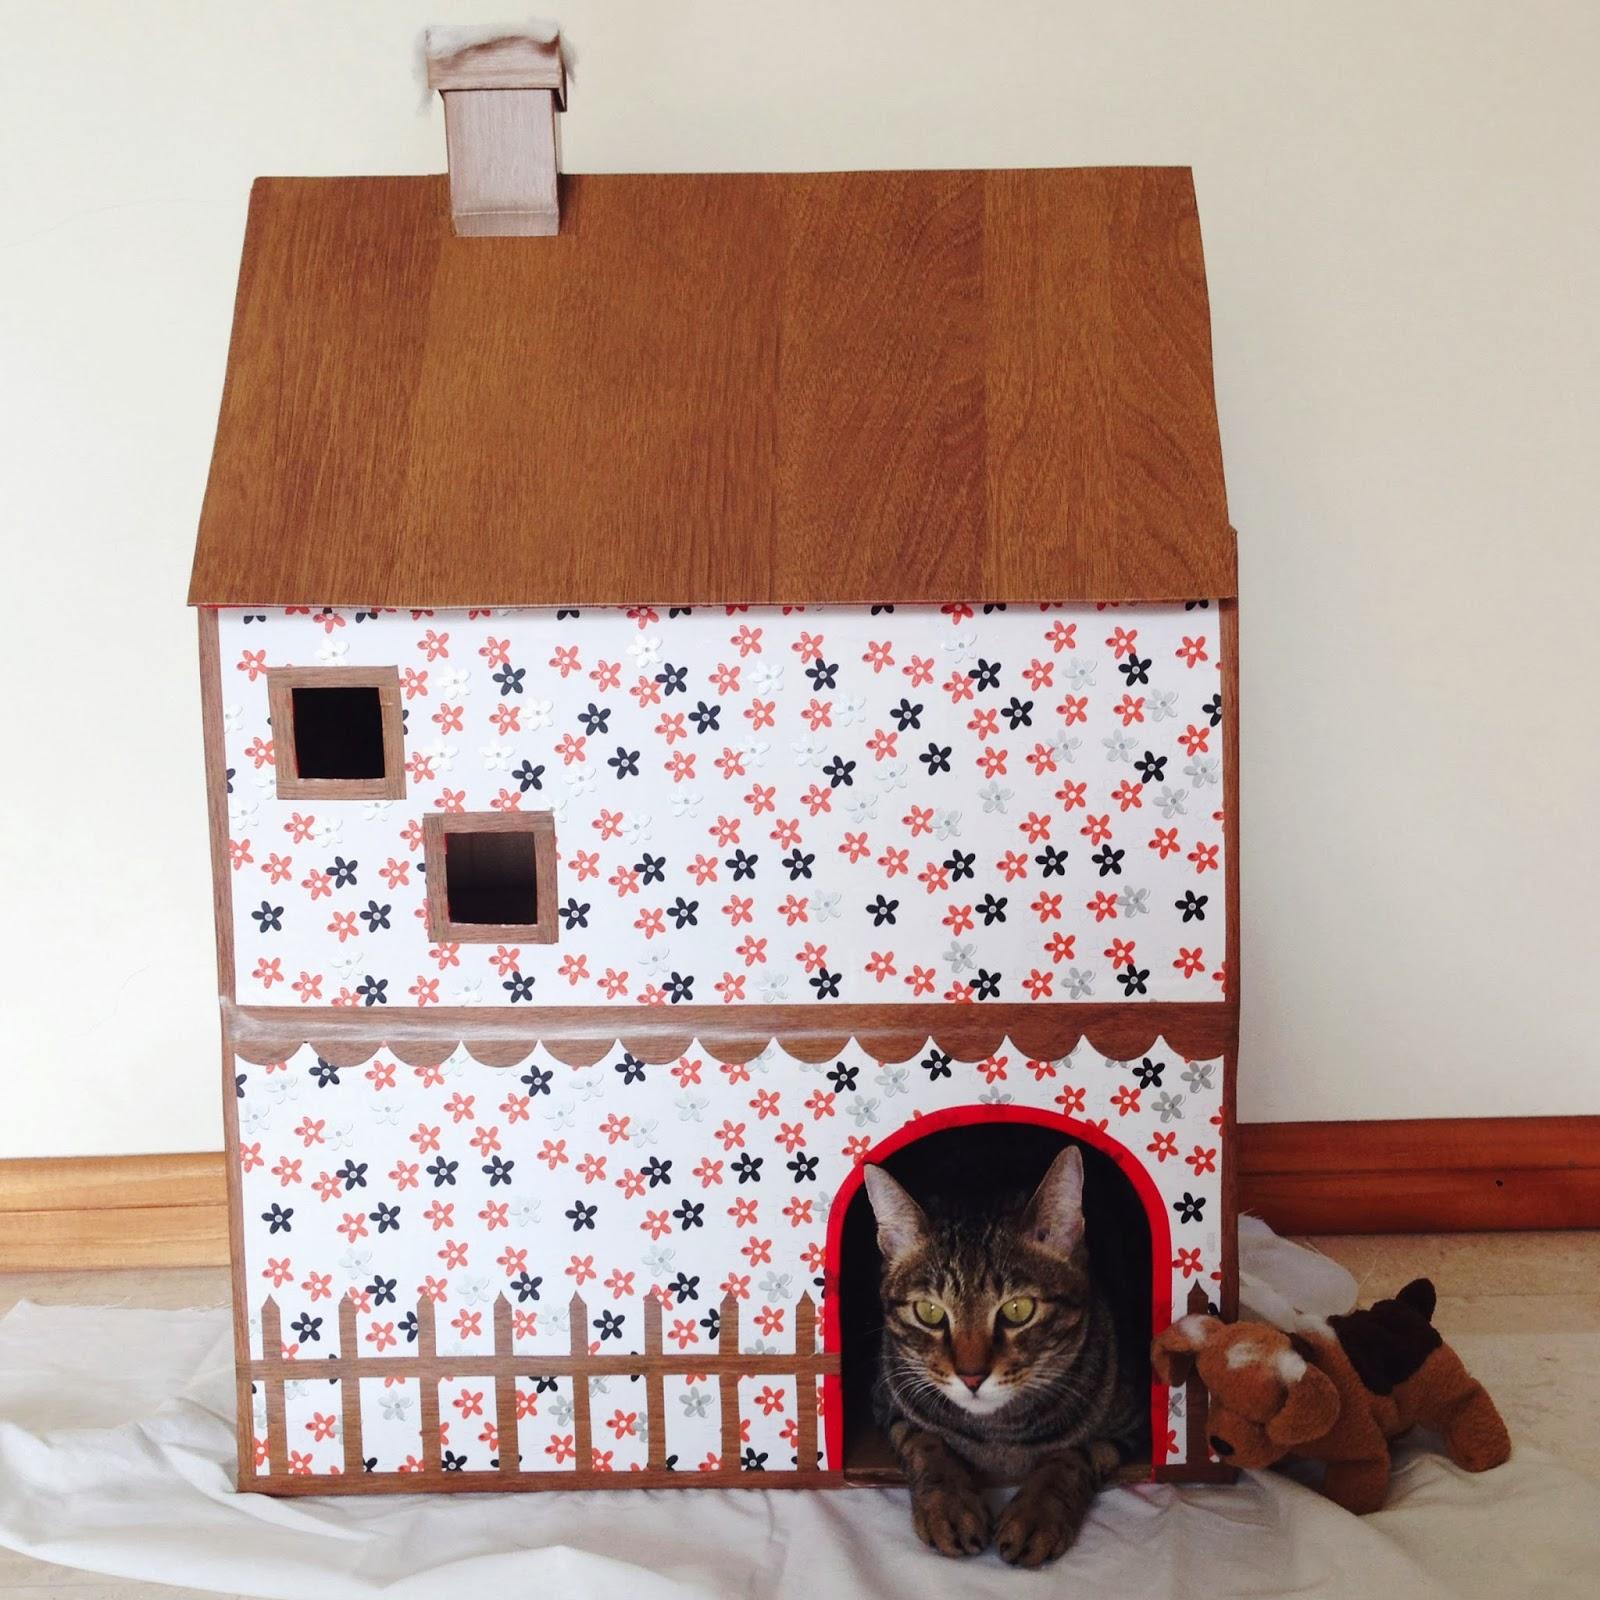 penny for a song cardboard cat house. Black Bedroom Furniture Sets. Home Design Ideas